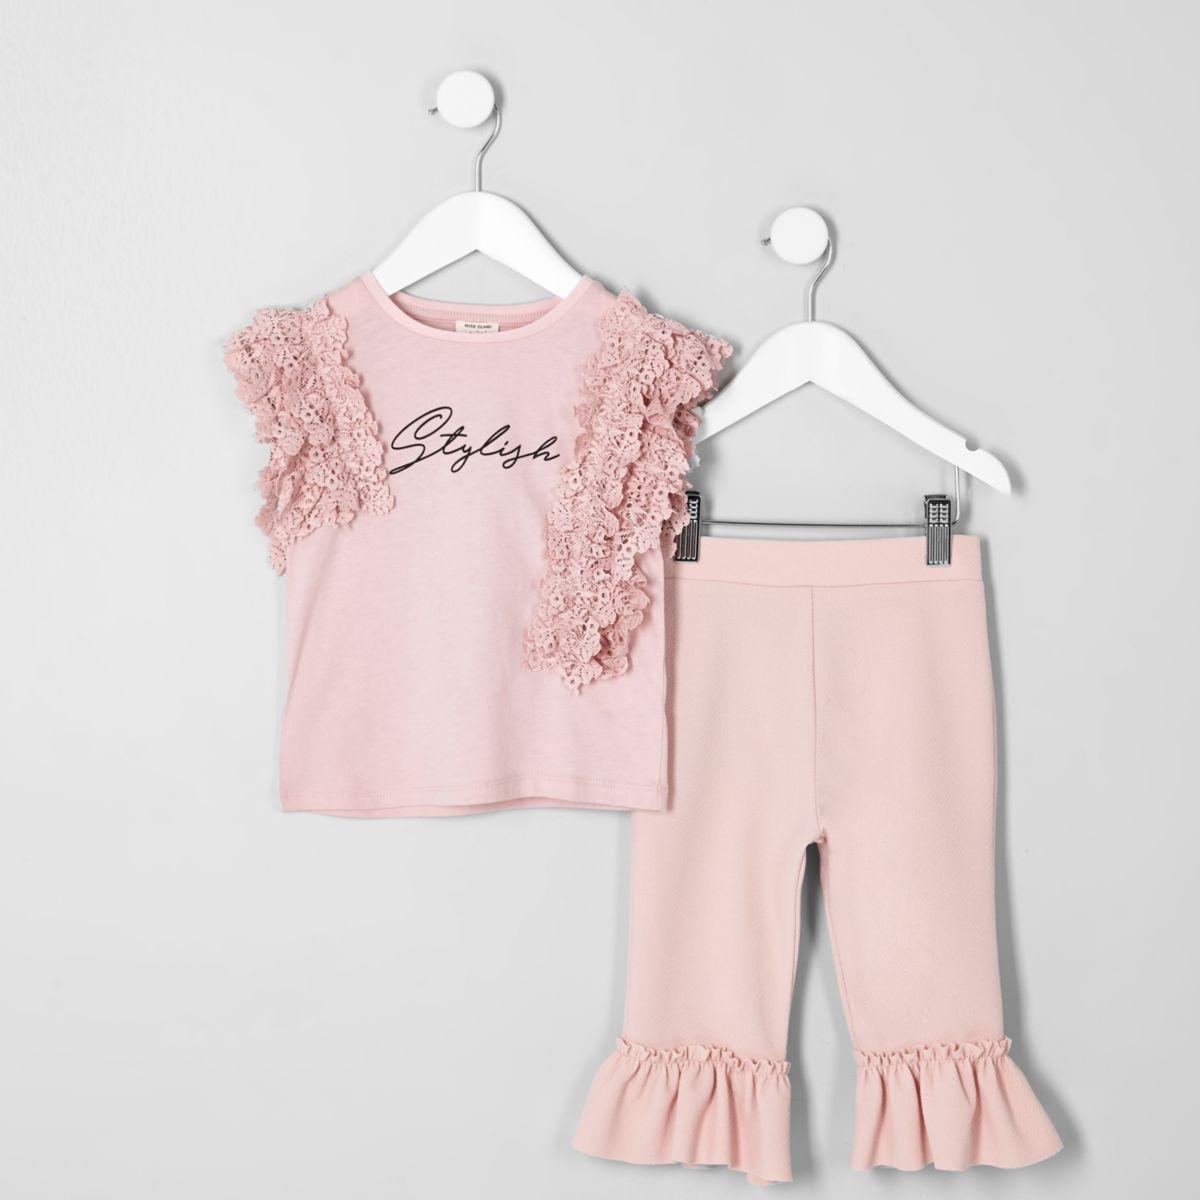 Mini girls pink 'stylish' lace top outfit